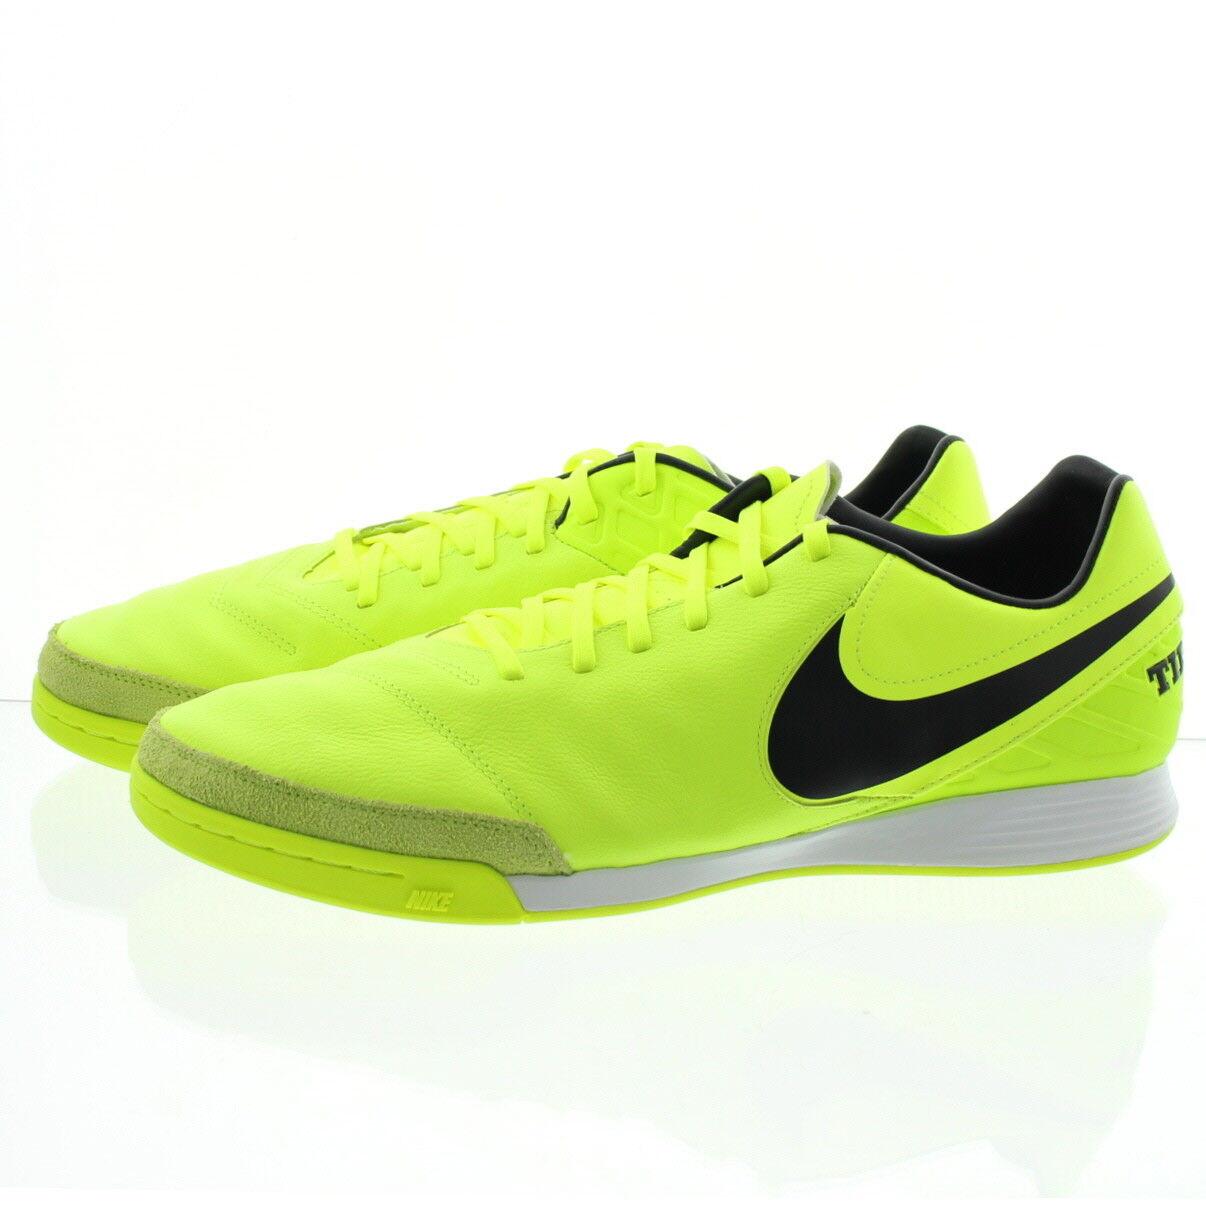 Nike 819222 in Uomo tiempo mystic v in 819222 top calcio atletico calcio scarpe basse 1baac7